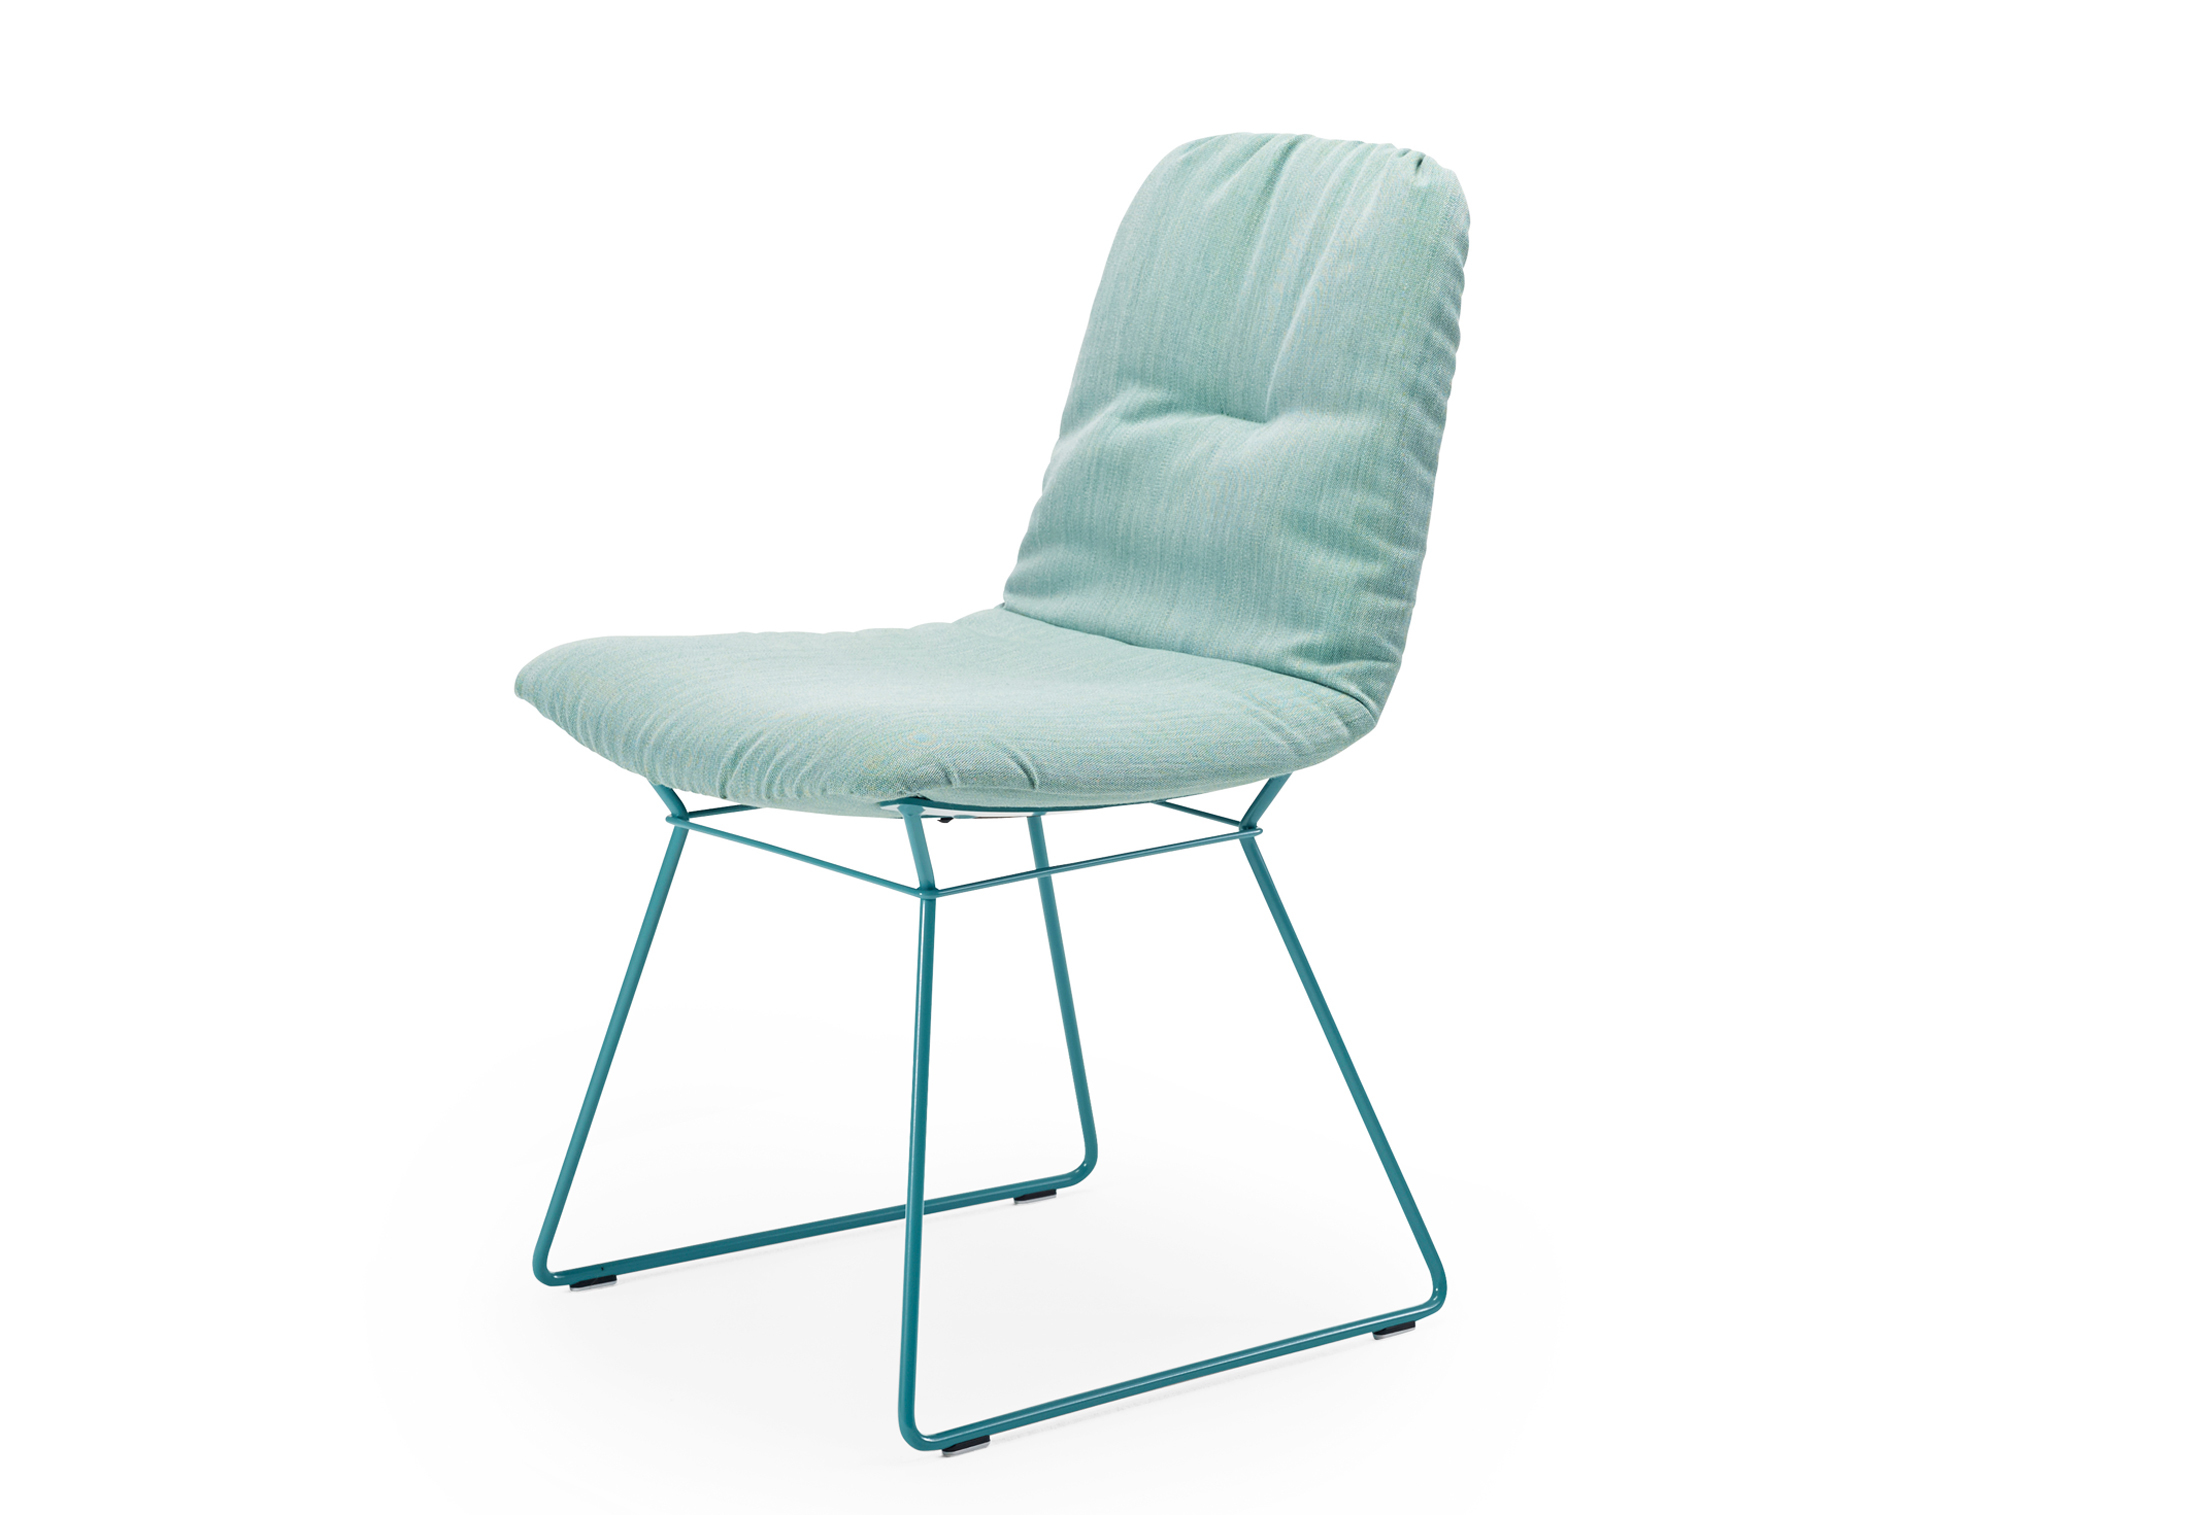 Leya chair with wire frame by Freifrau | STYLEPARK